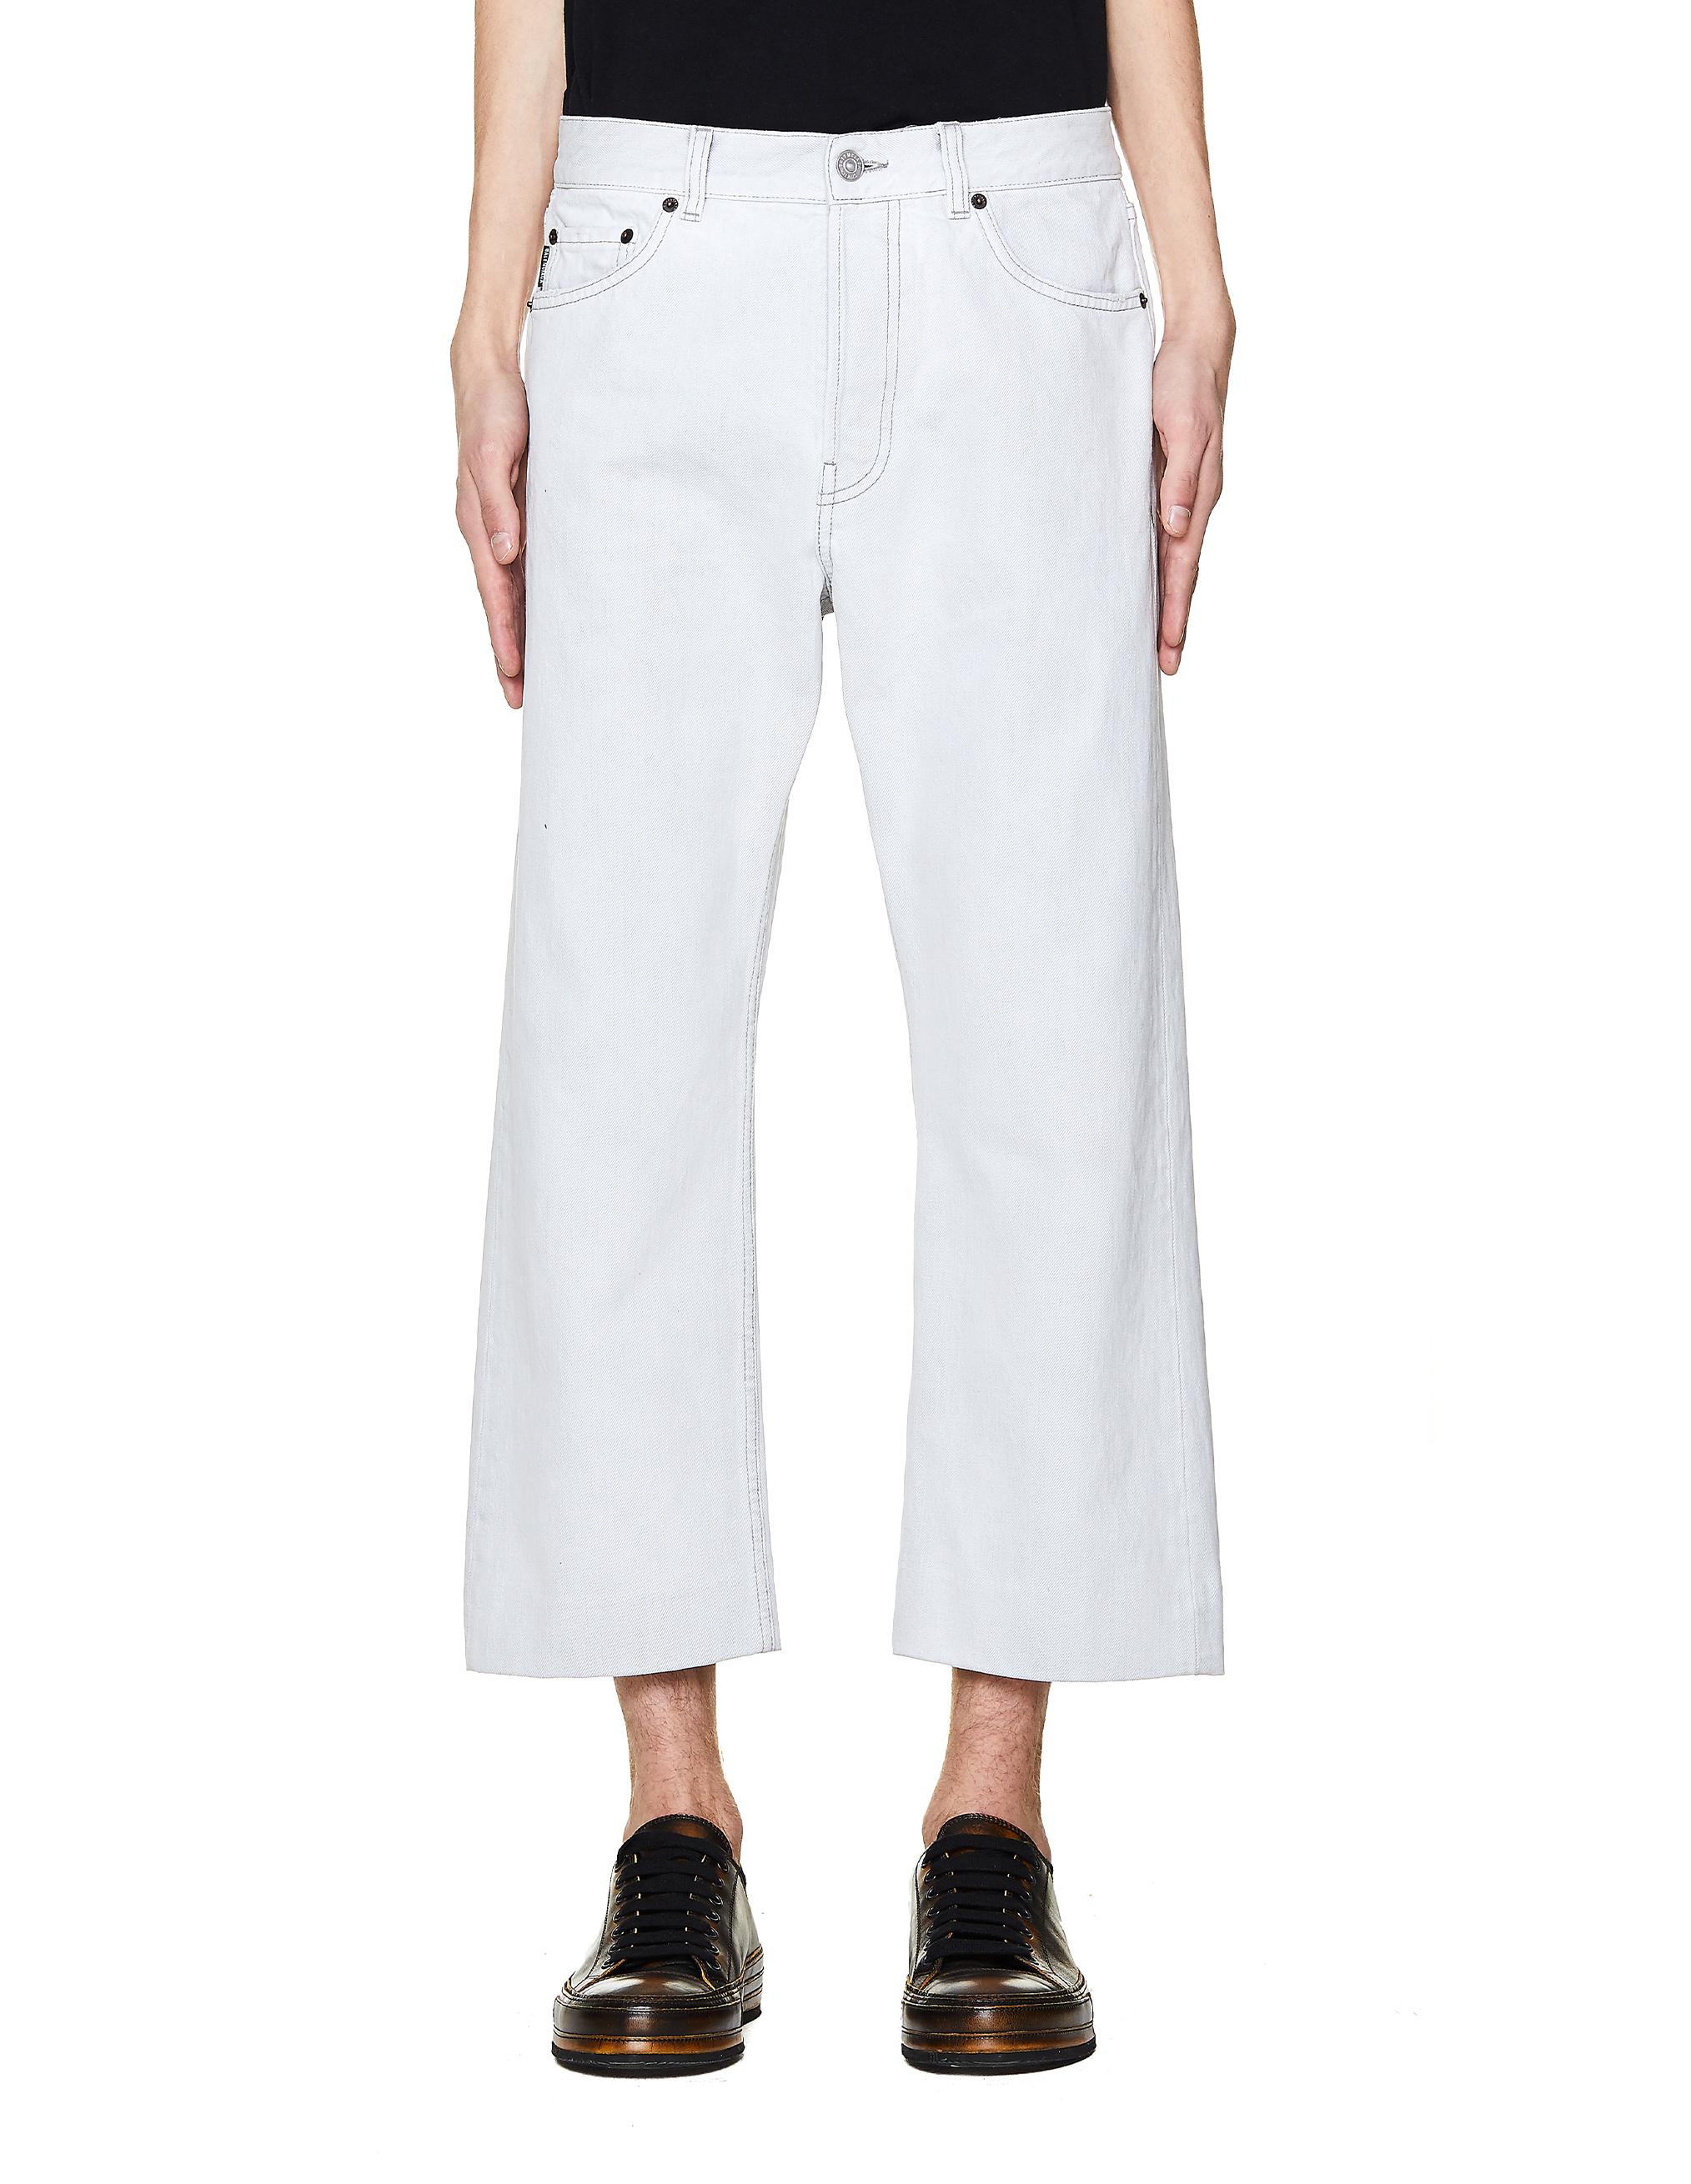 Balenciaga White Cropped Cotton Jeans